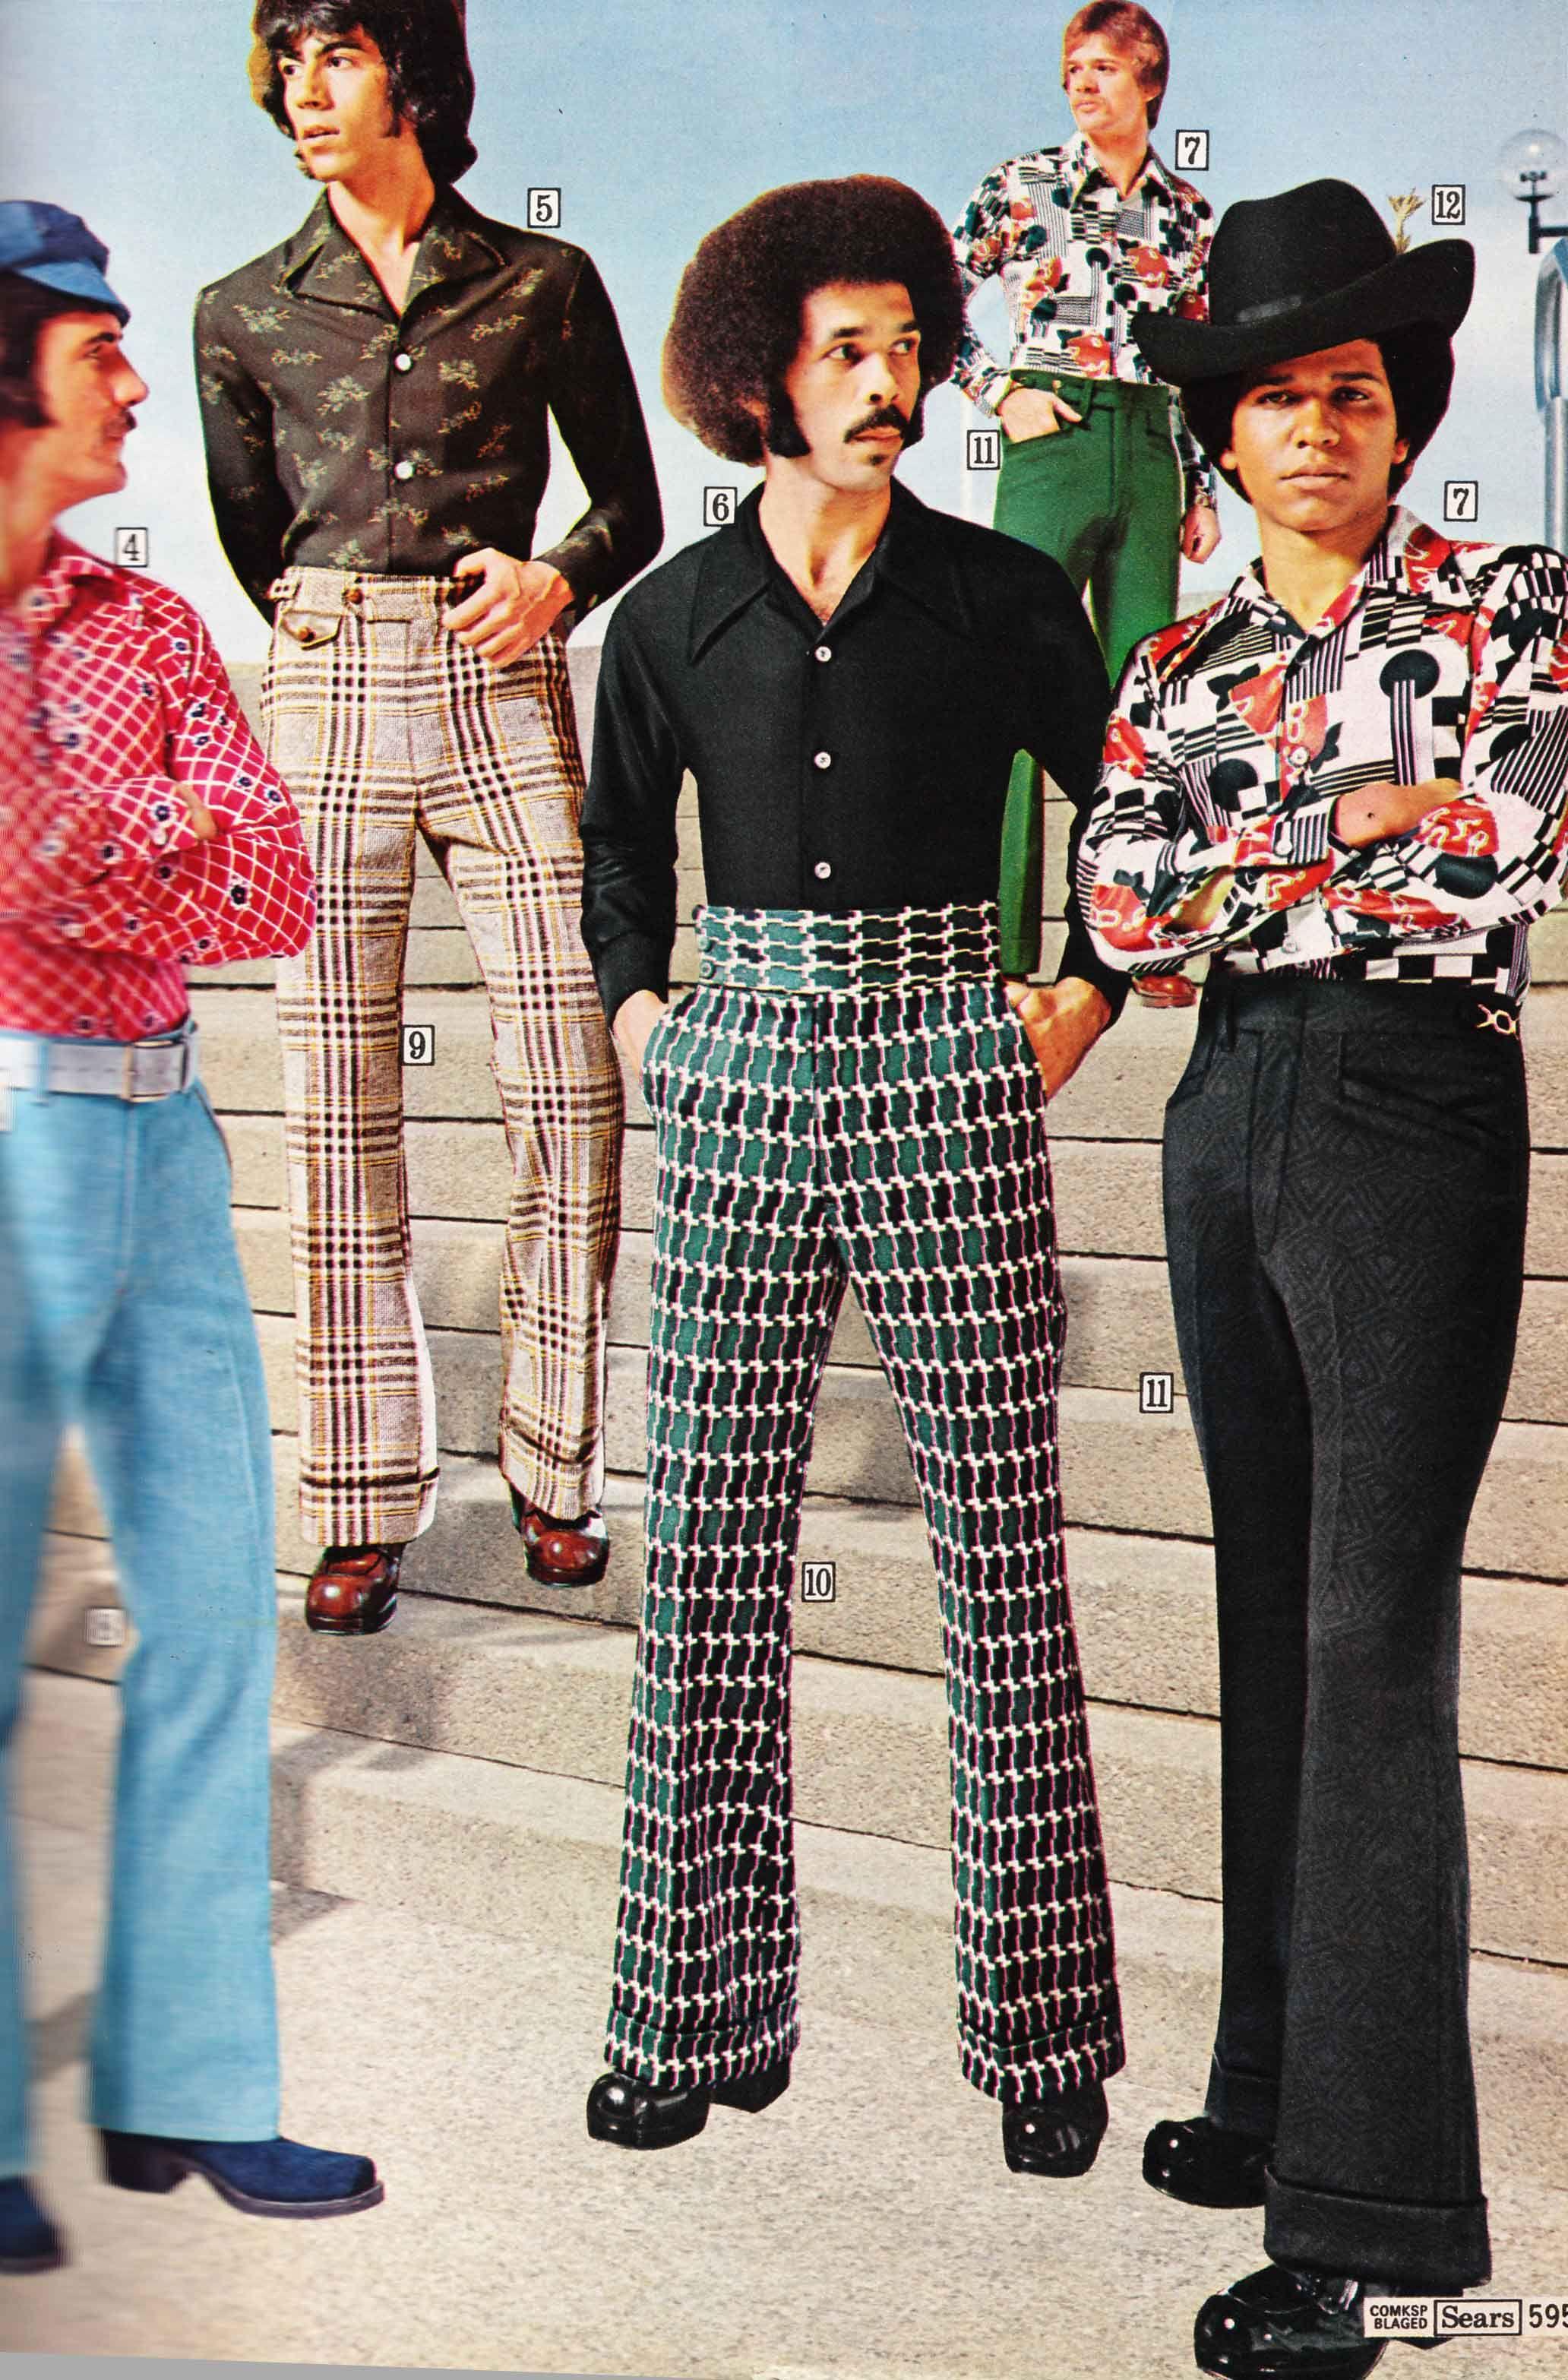 Mannermode 1974 Ideas Of The Seventies Pinterest Moda Anos 70